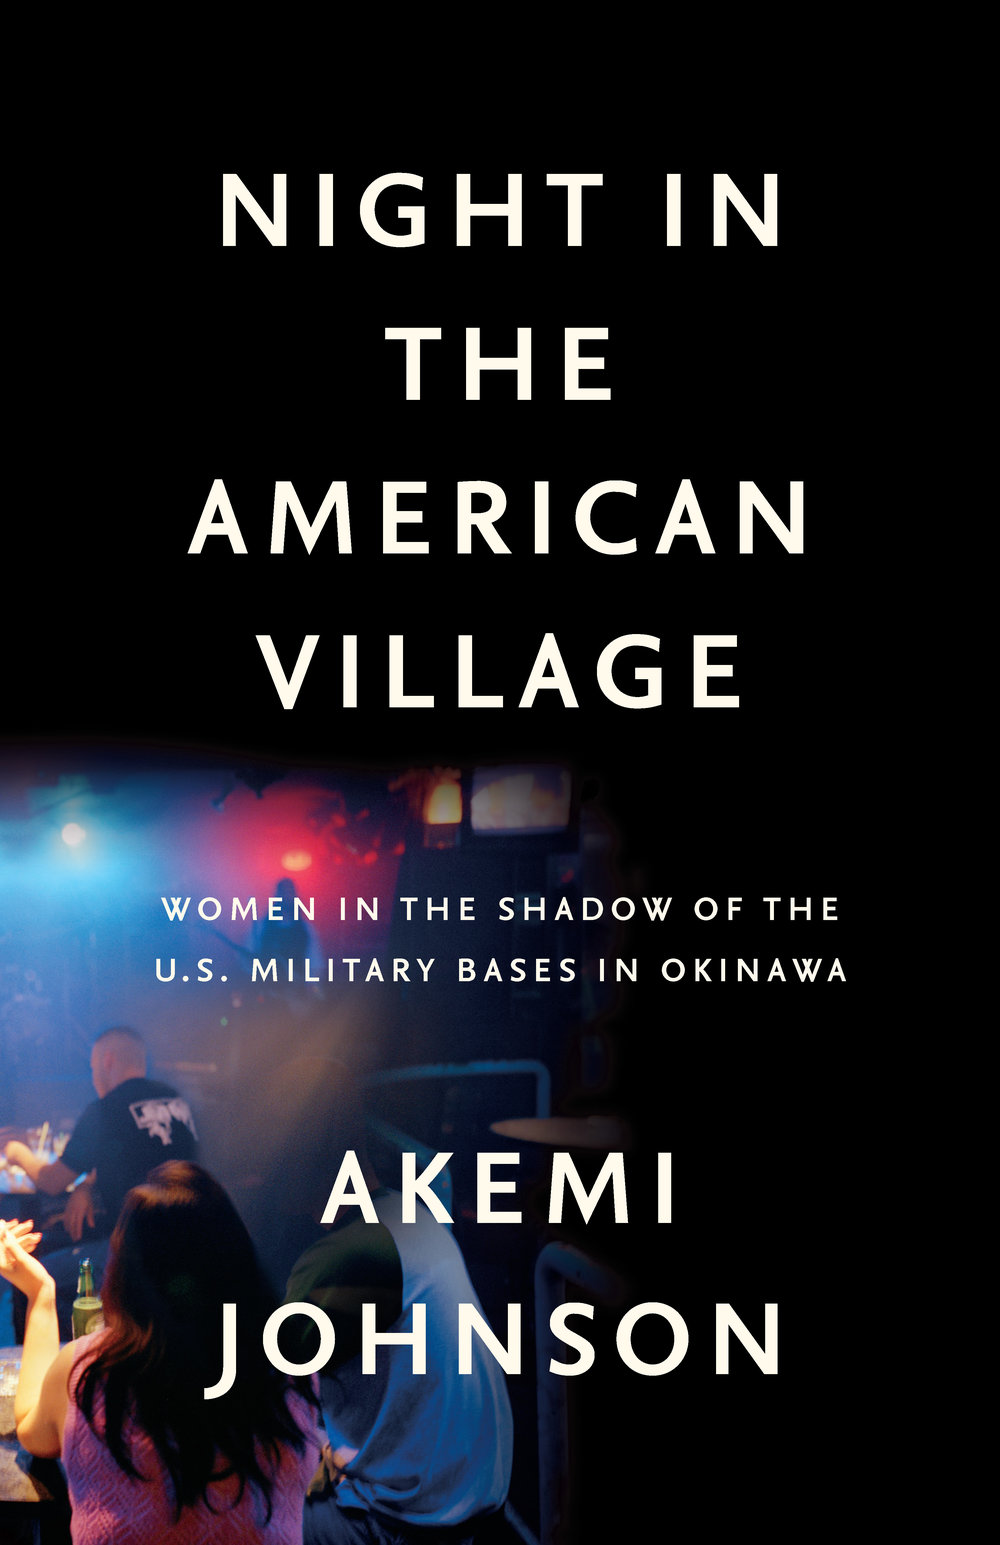 night_in_the_american_village_rev5.jpg